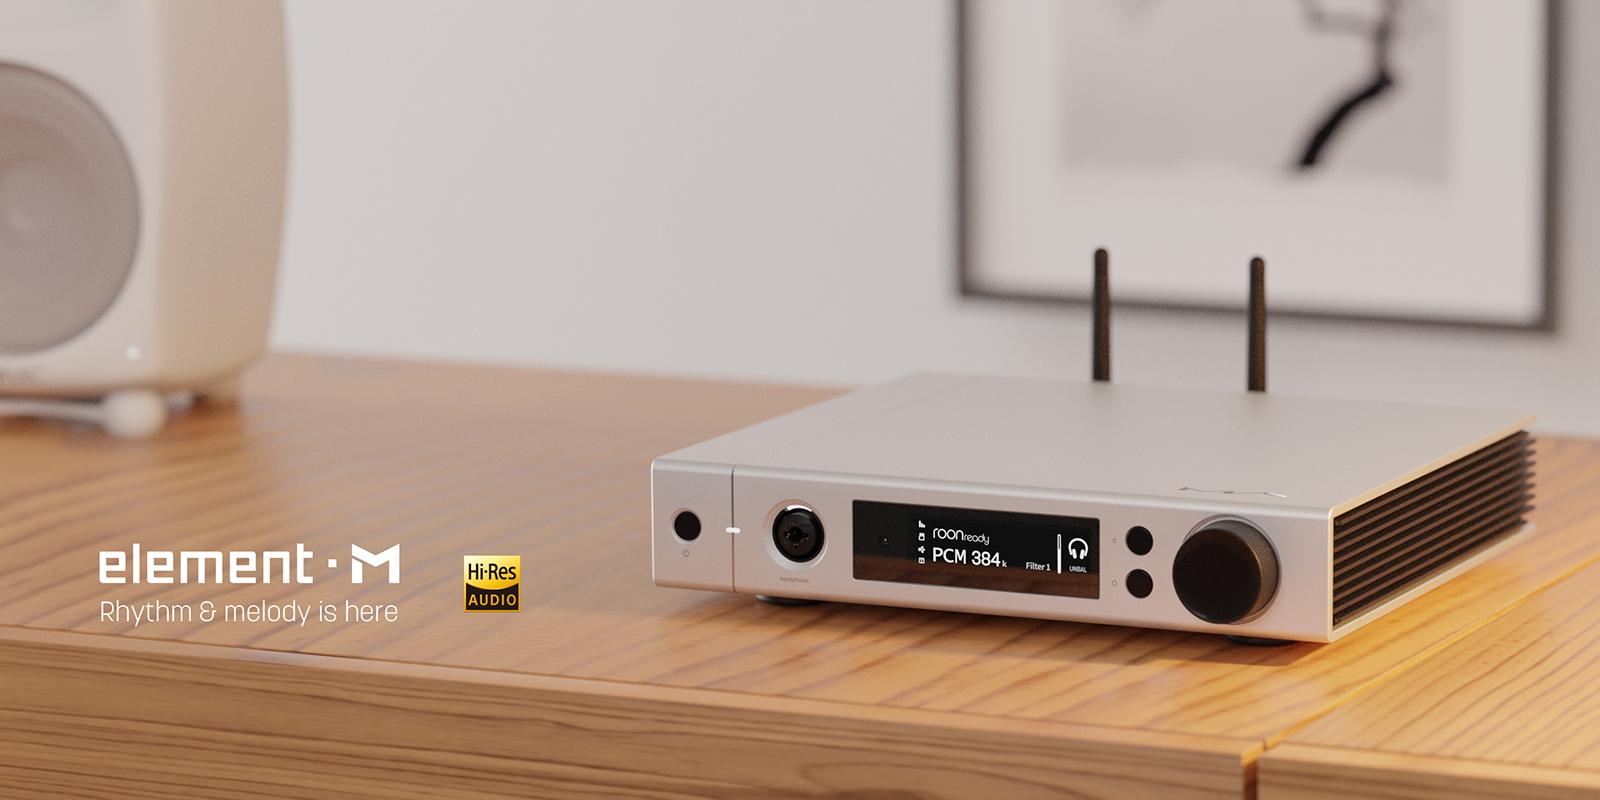 Matrix Audio element M streamer